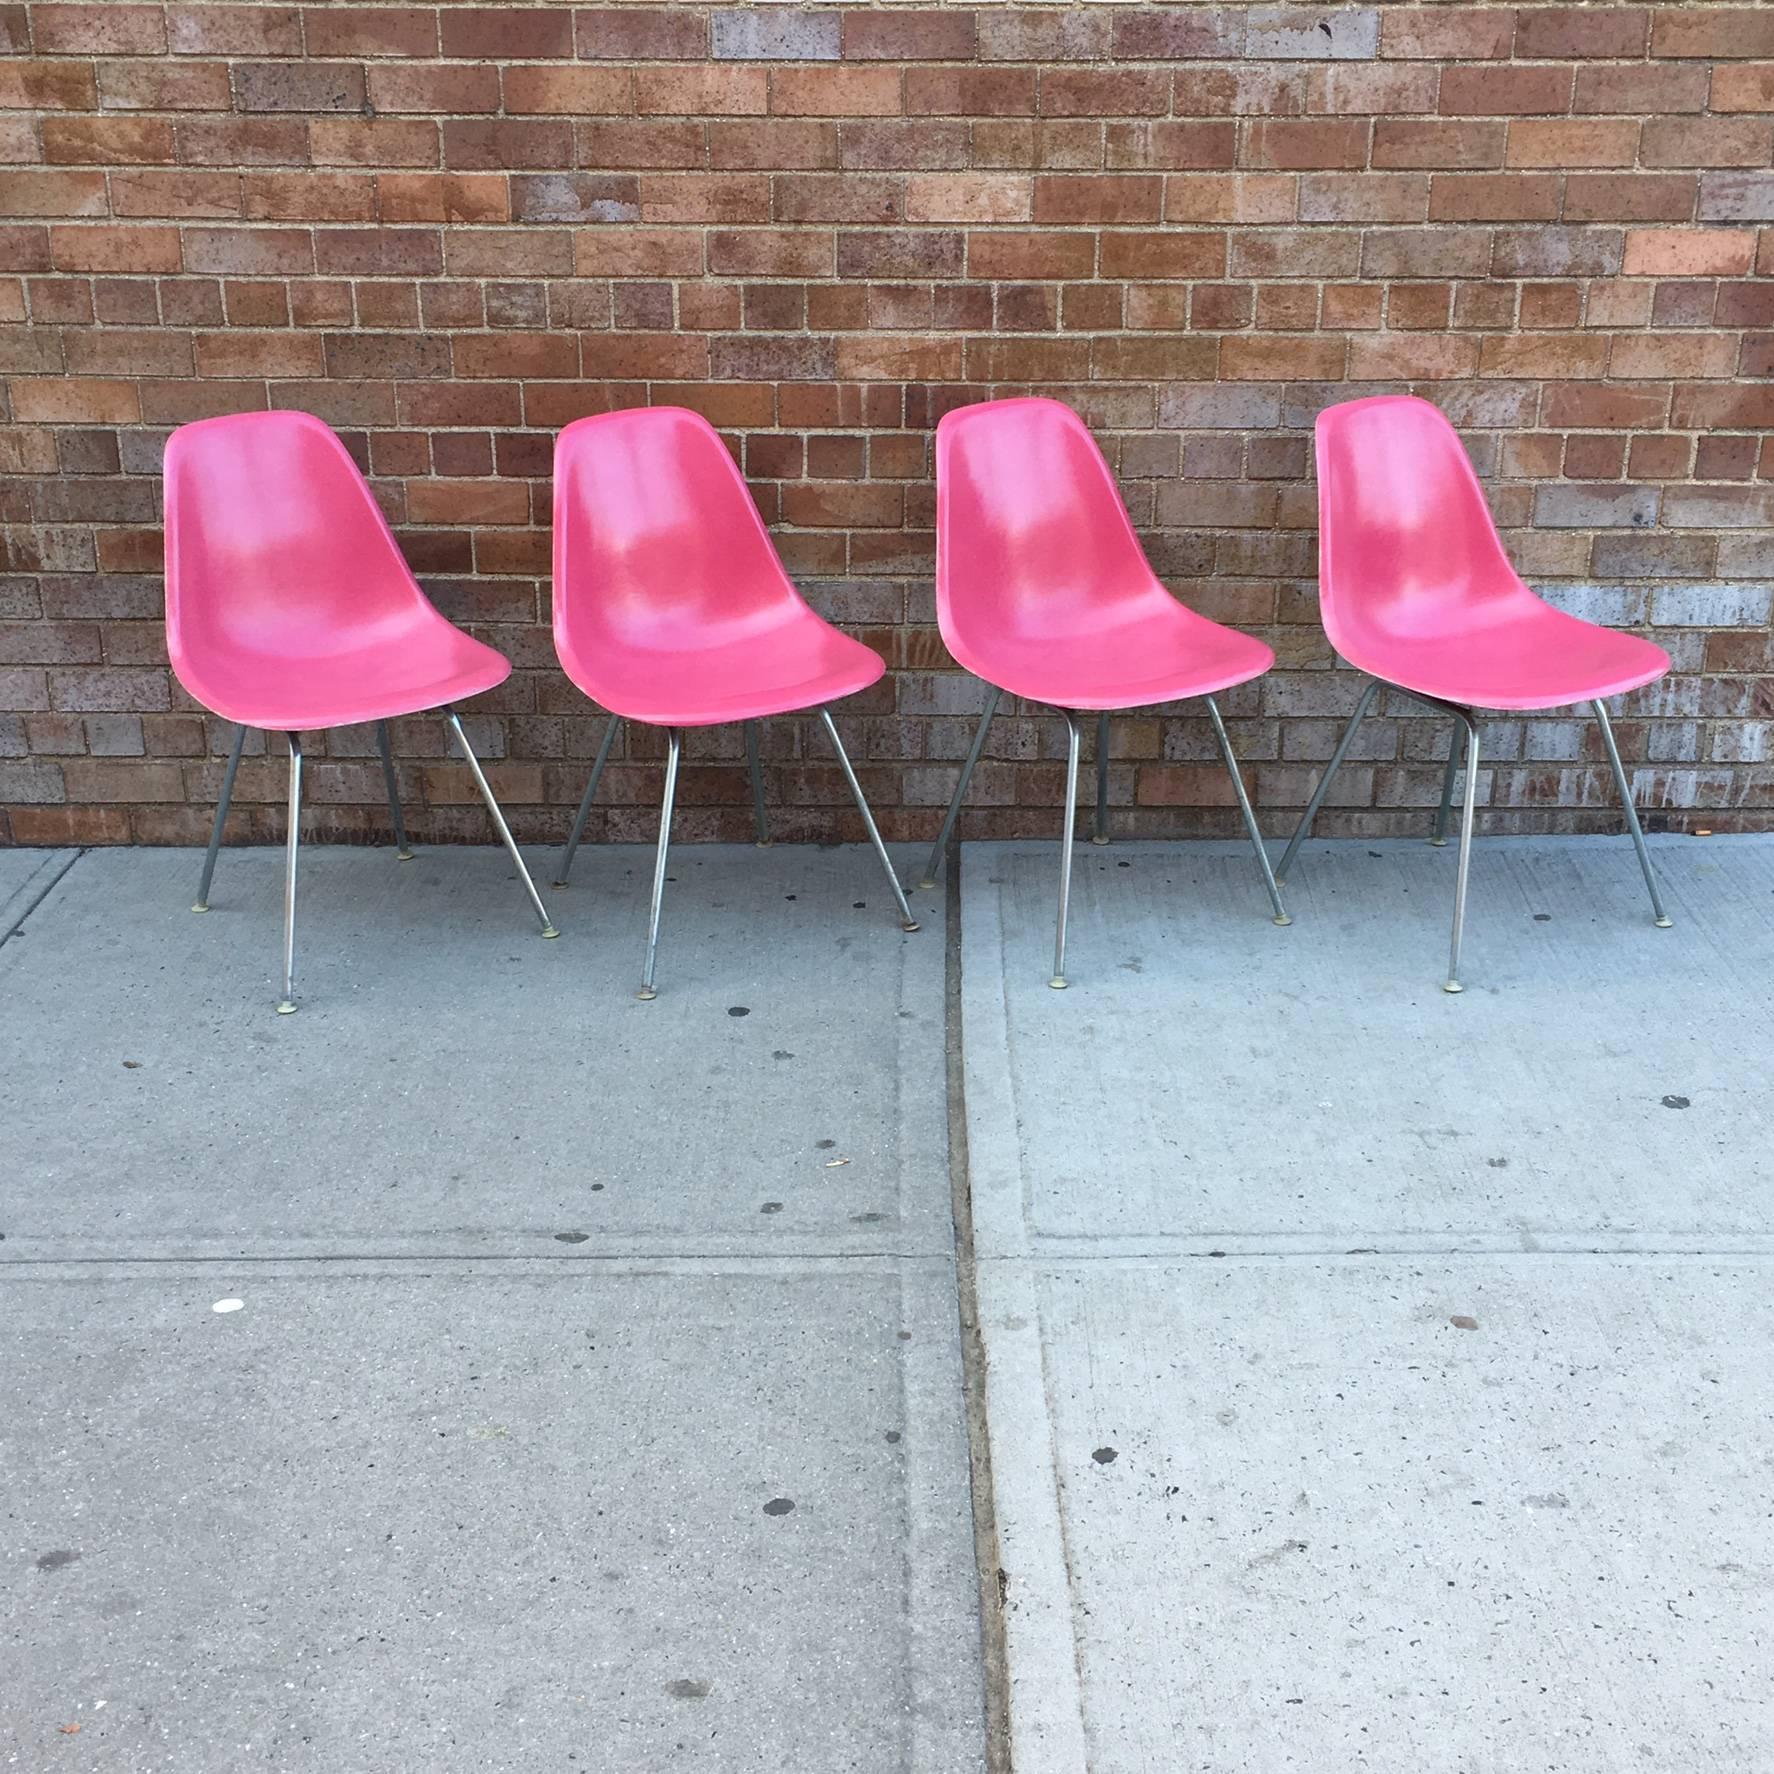 Four Supremely Rare Flamingo Pink Herman Miller Eames at 1stdibs